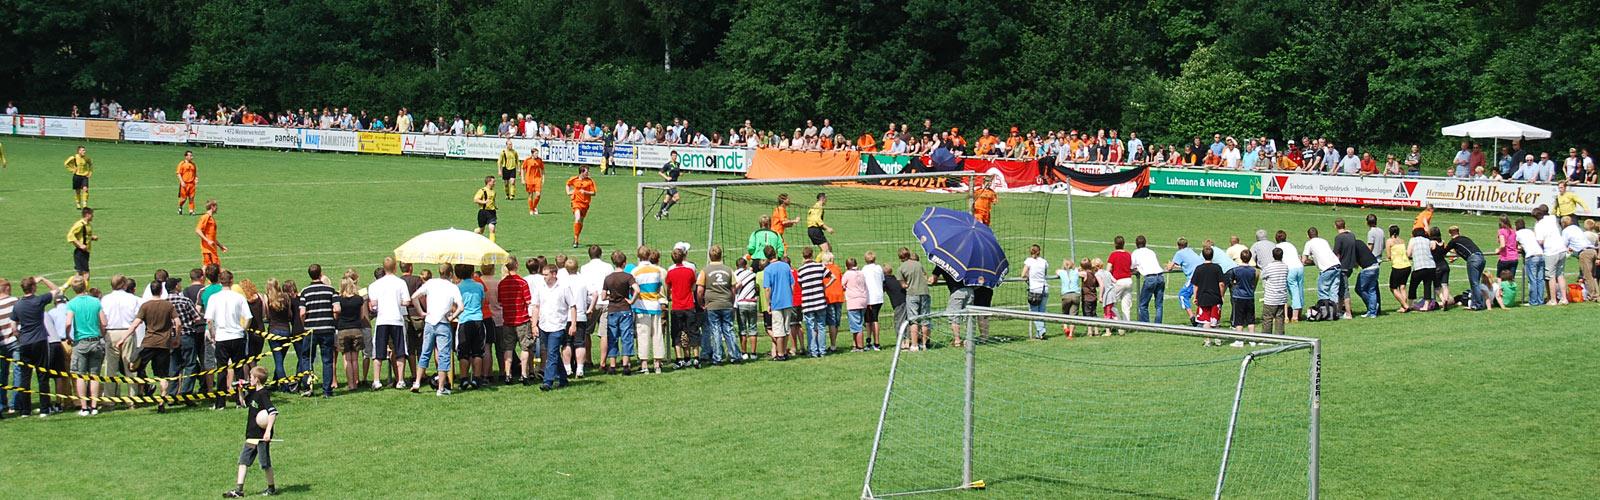 Fußballfeld